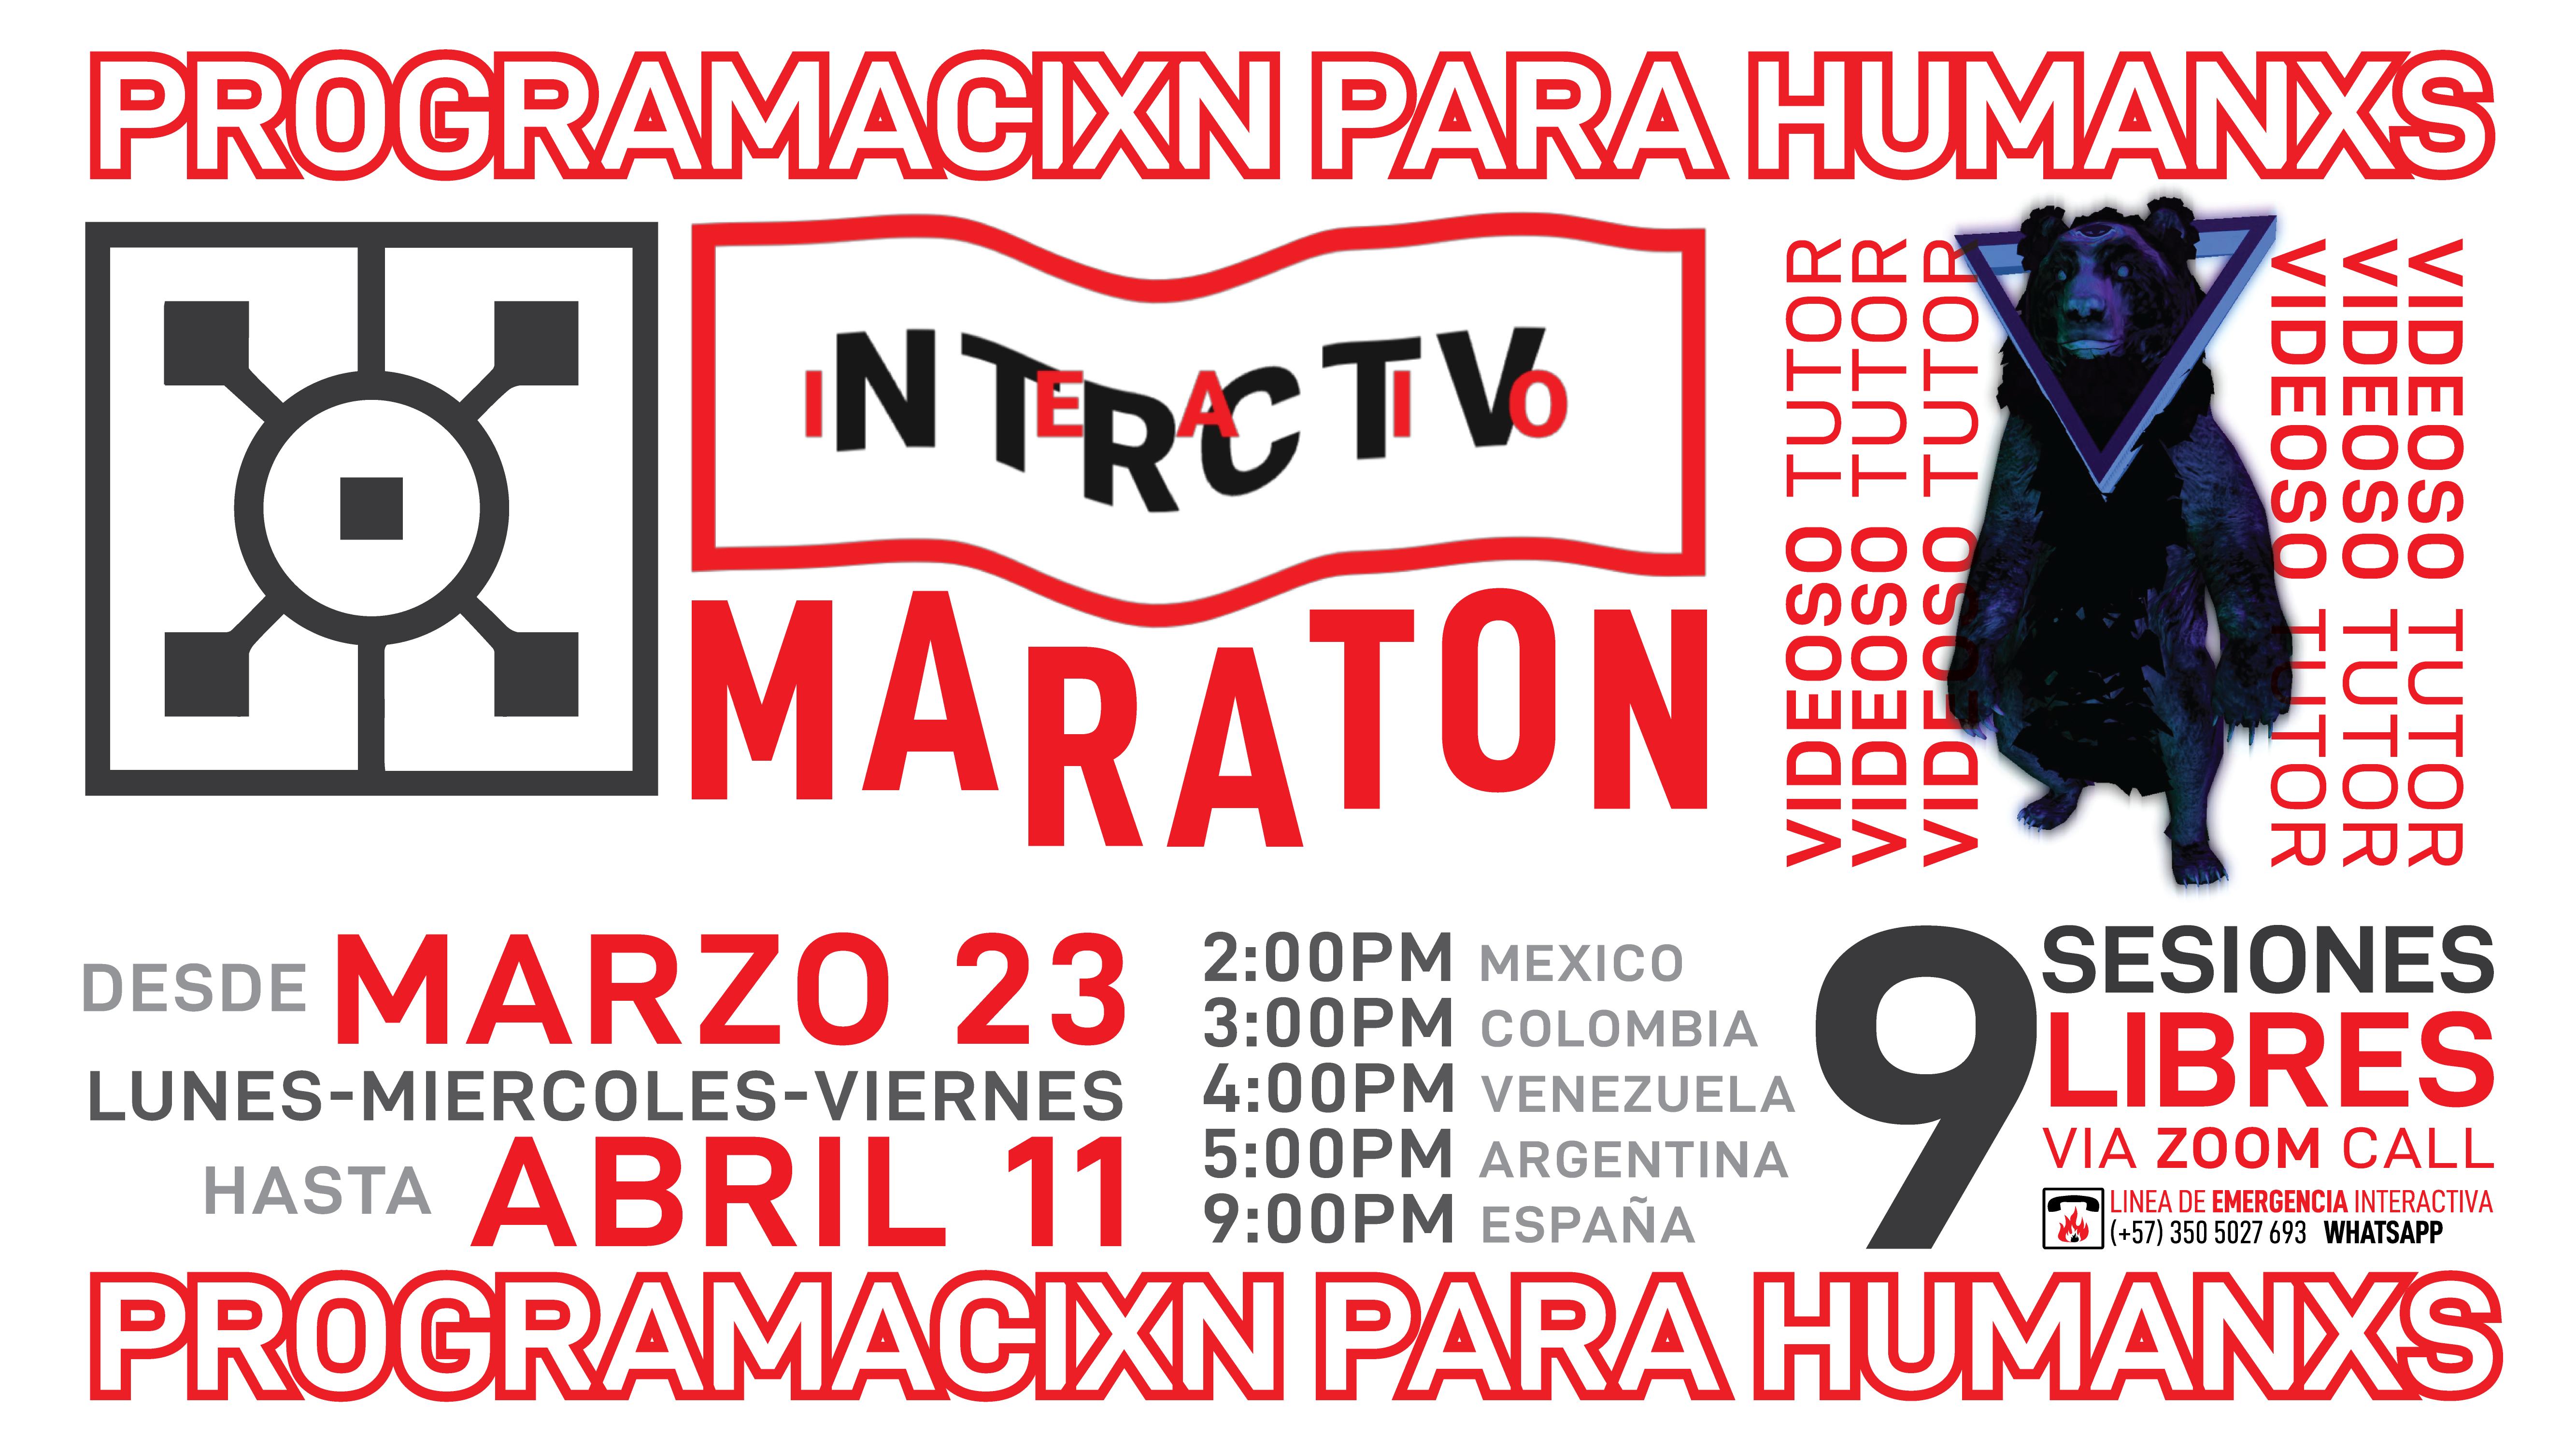 maraton_ntrctv_face-01_0.png